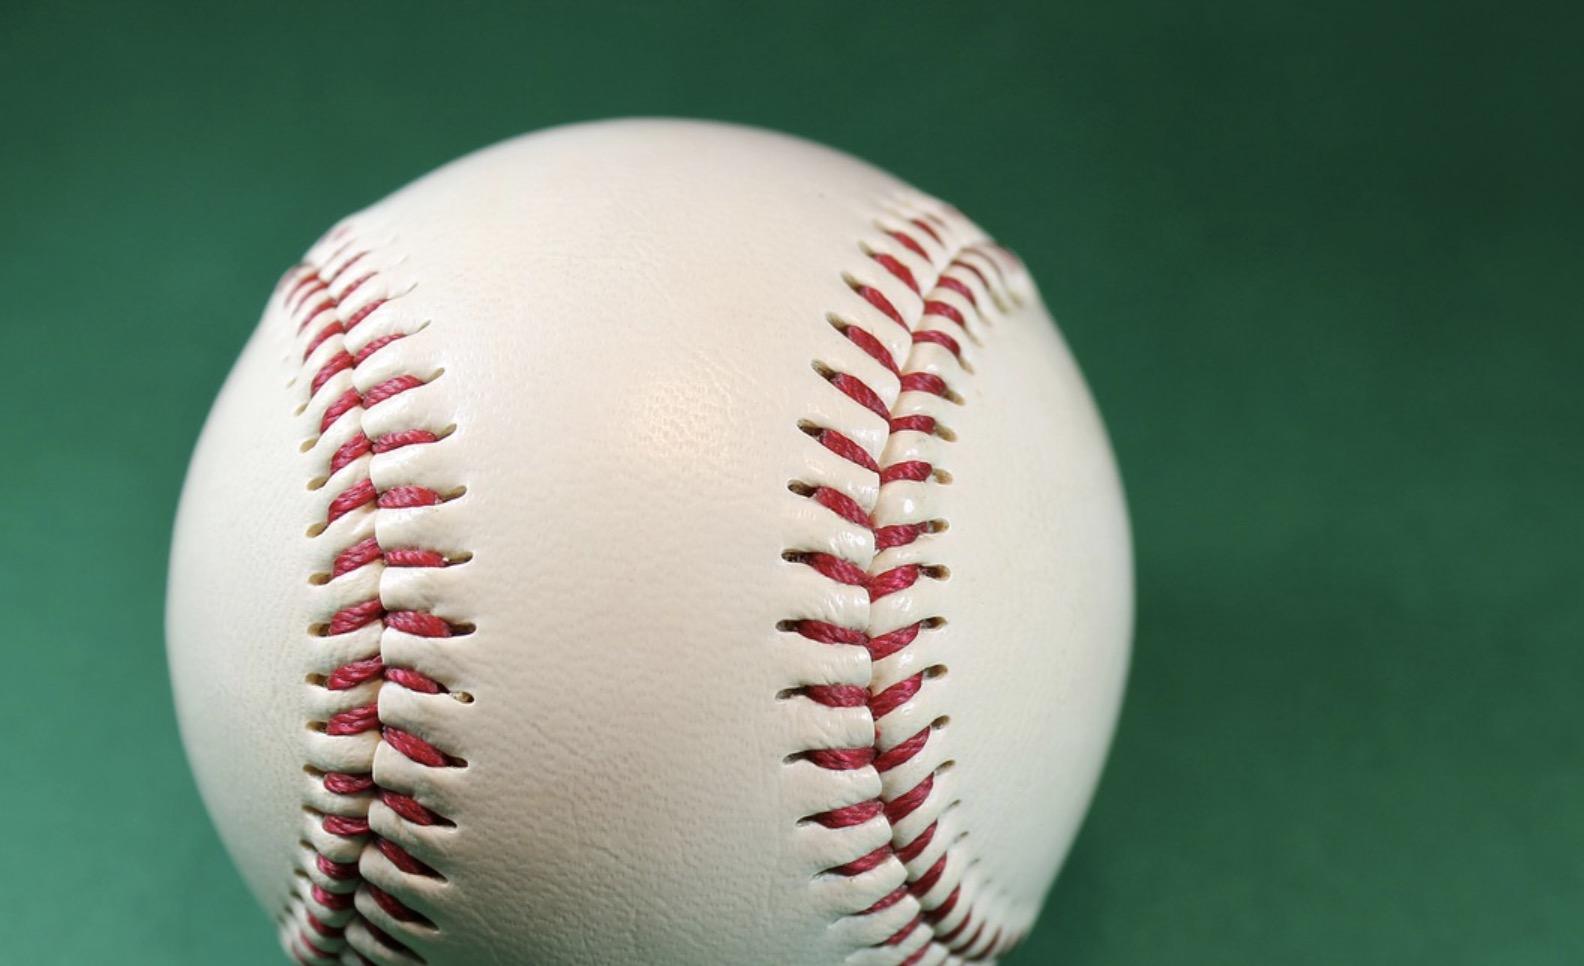 Typy na baseball - 8 grudnia (sobota)